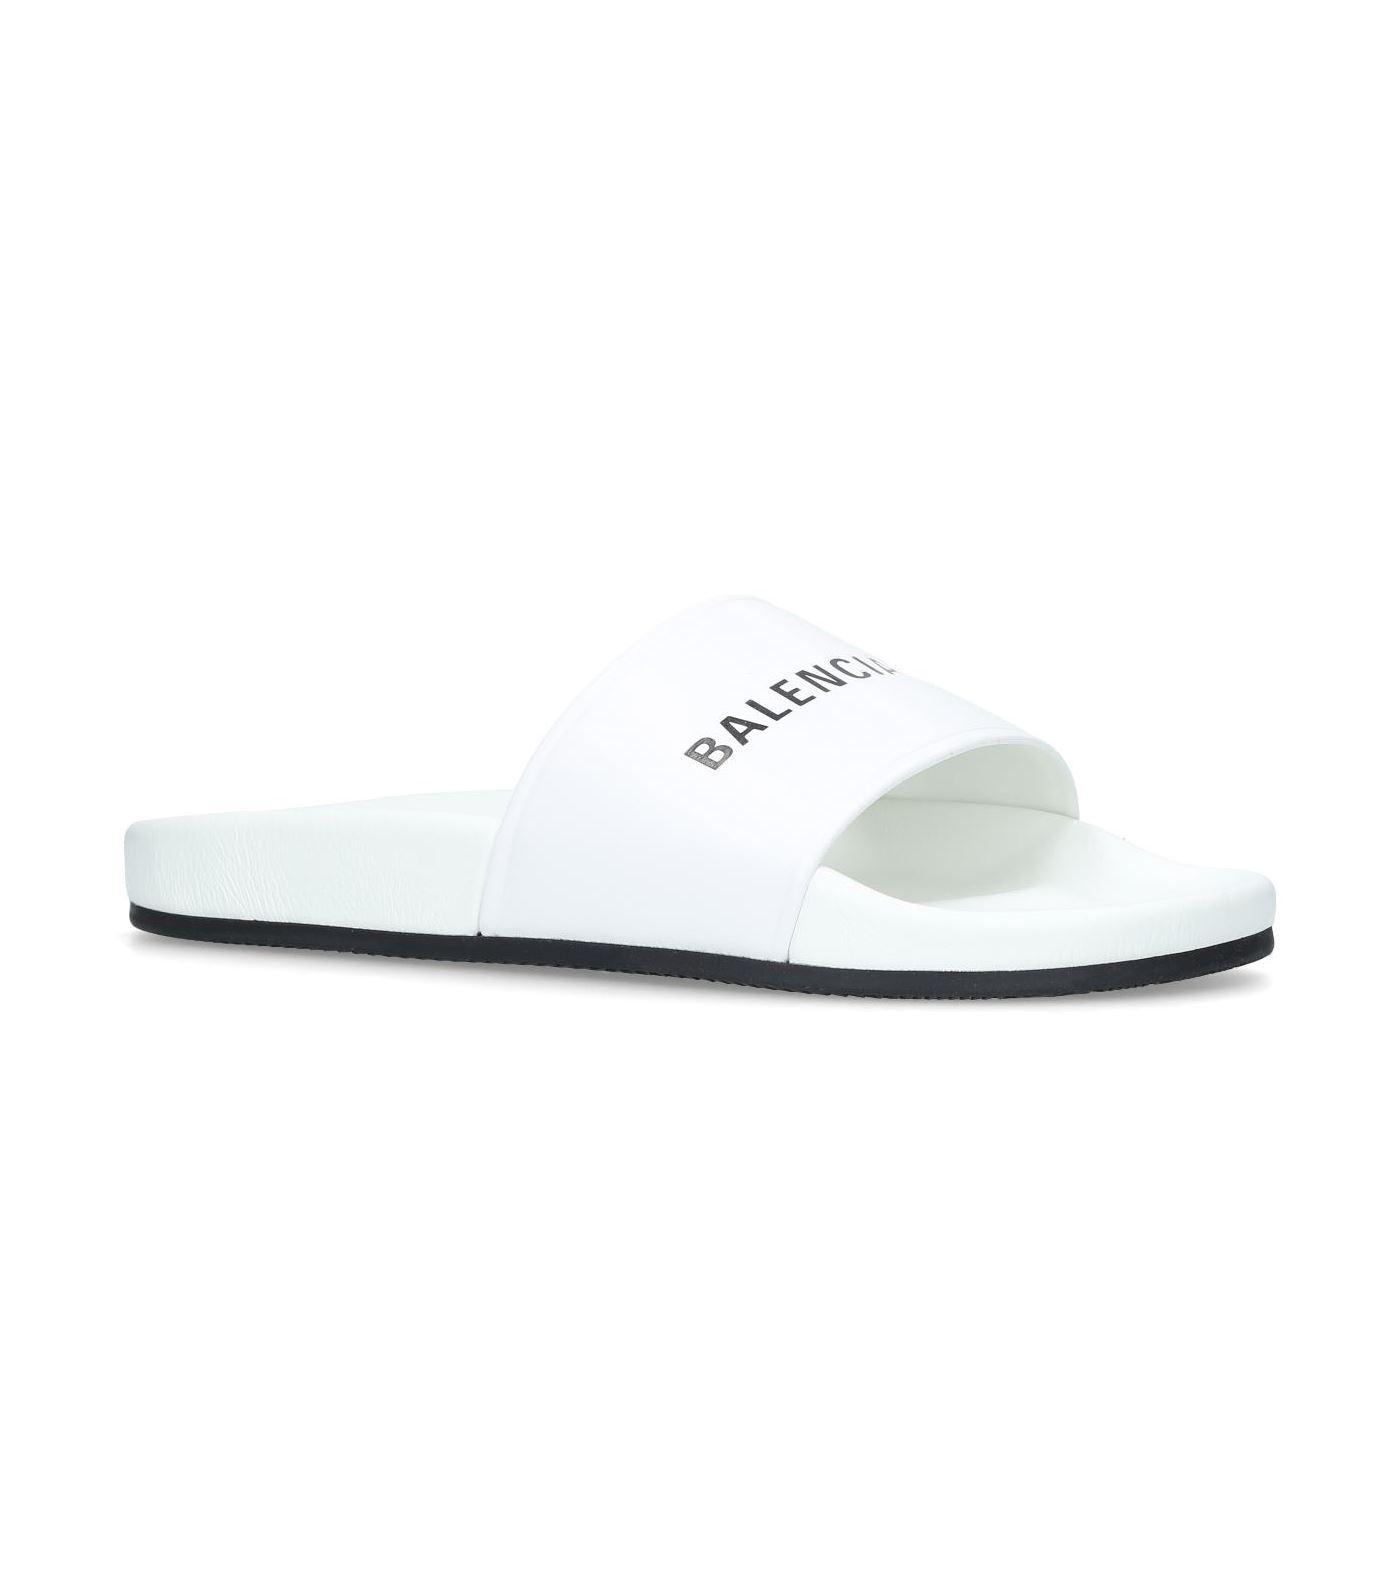 7185af950dde Lyst - Balenciaga Logo Pool Slides in White - Save 25%